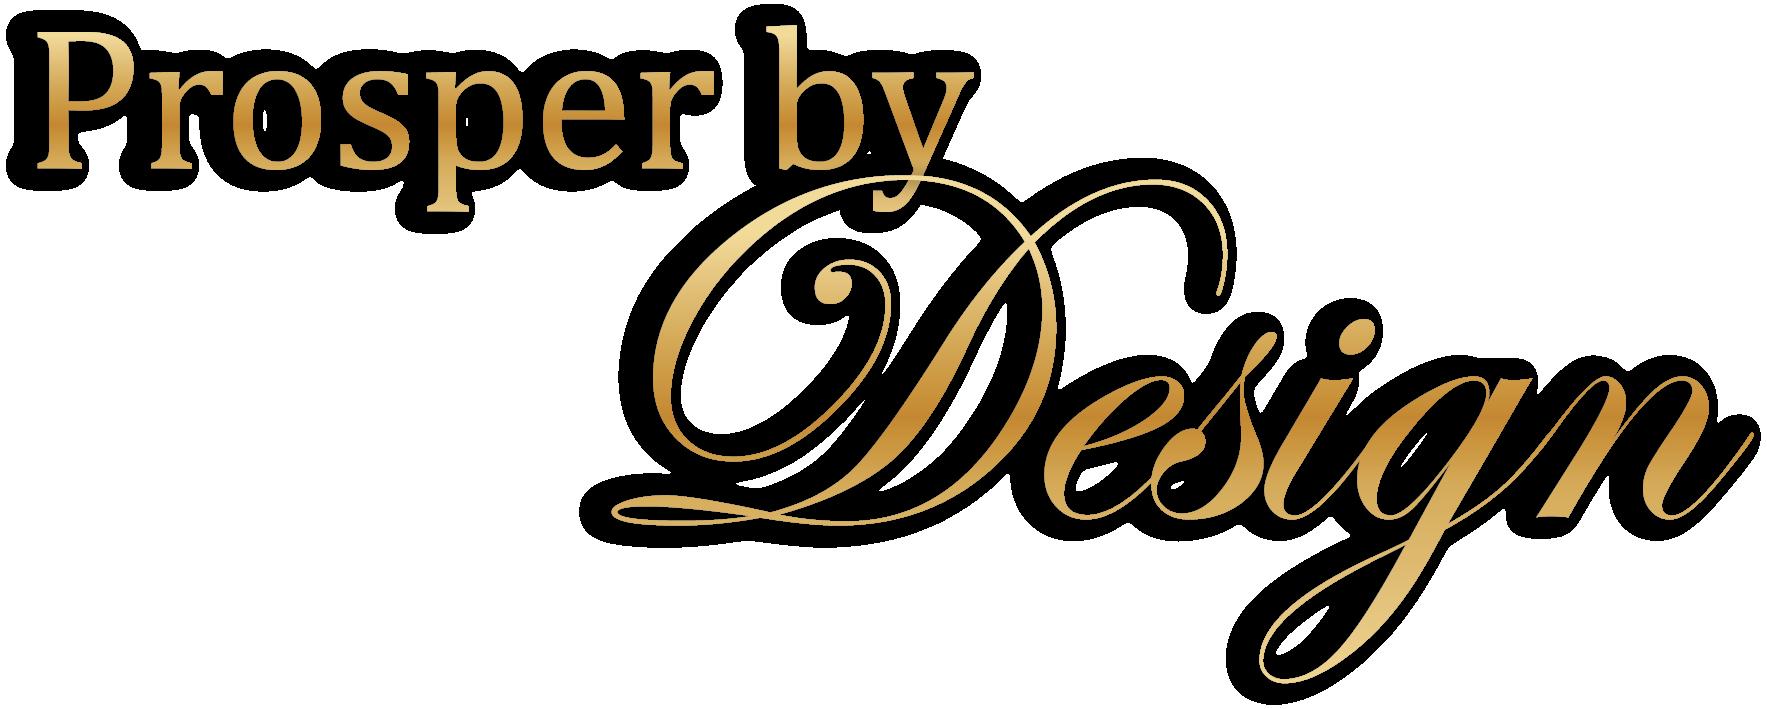 Prosper By Design Coach Certification